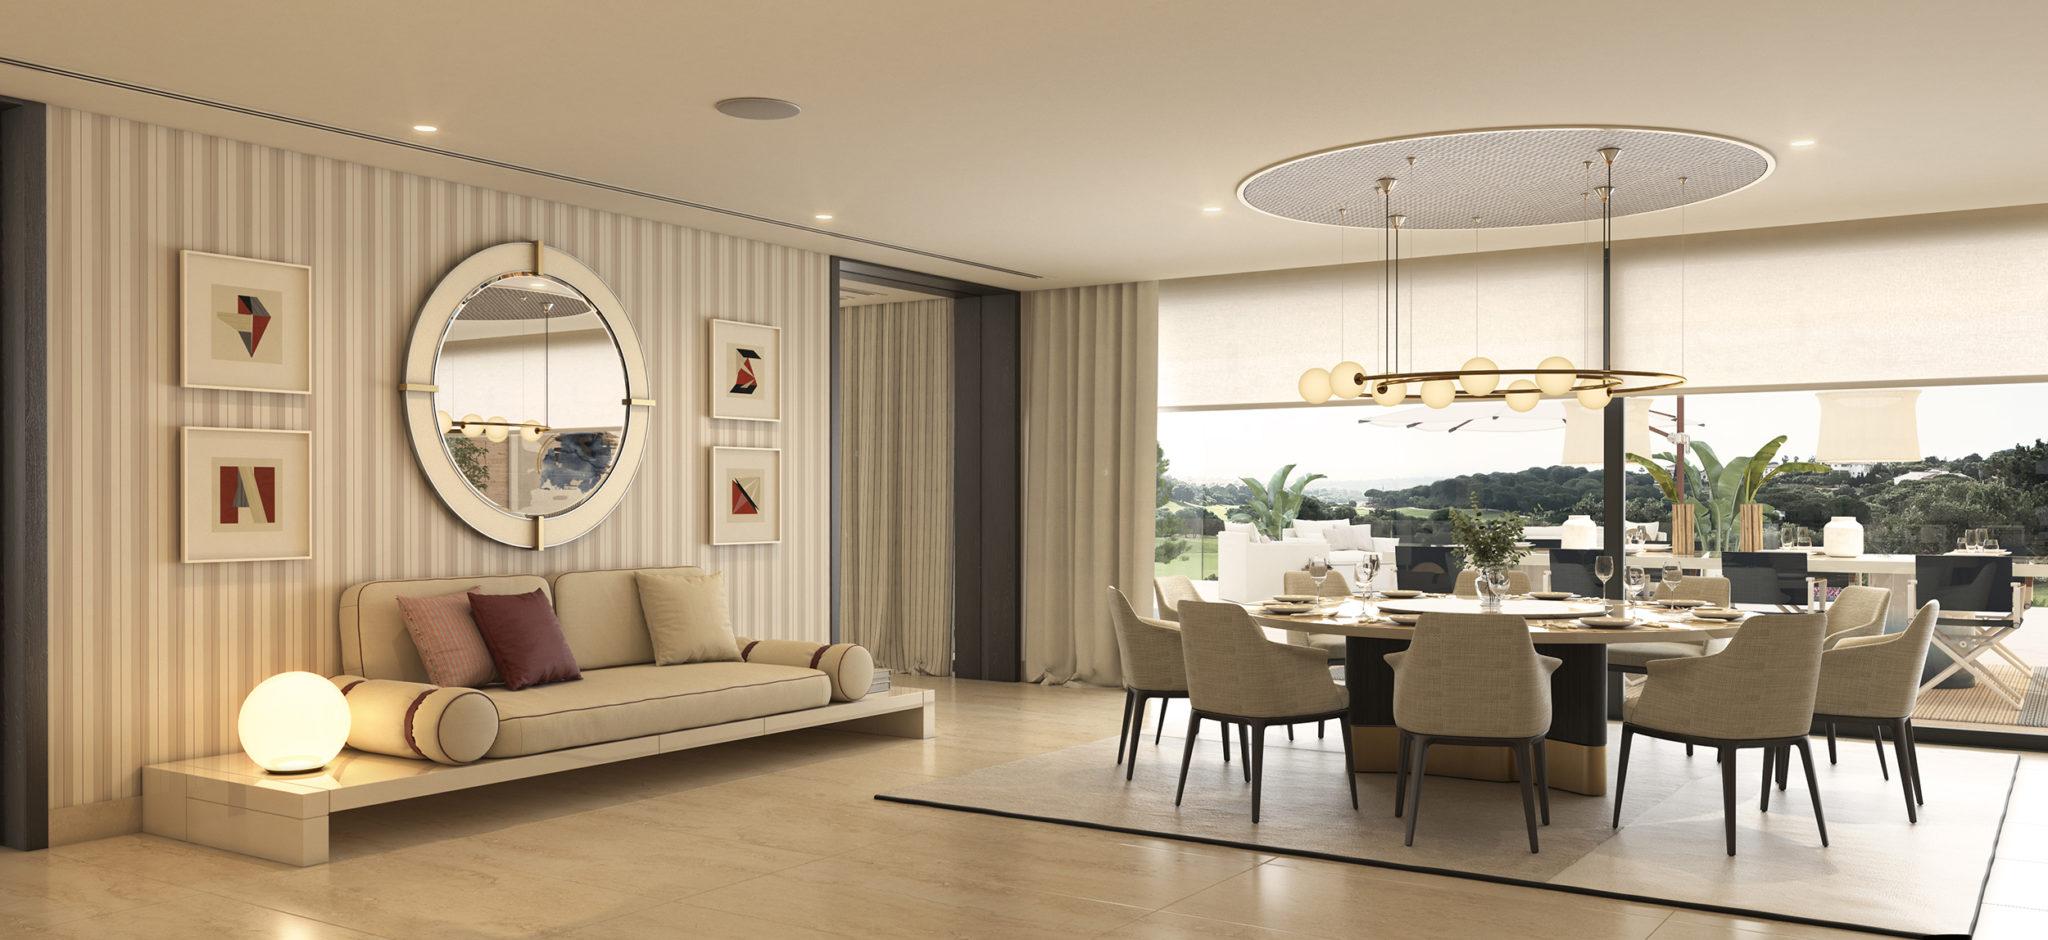 Luxury villa by Sotogrande S.A. - Luxury Real Estate In Sotogrande, Spain